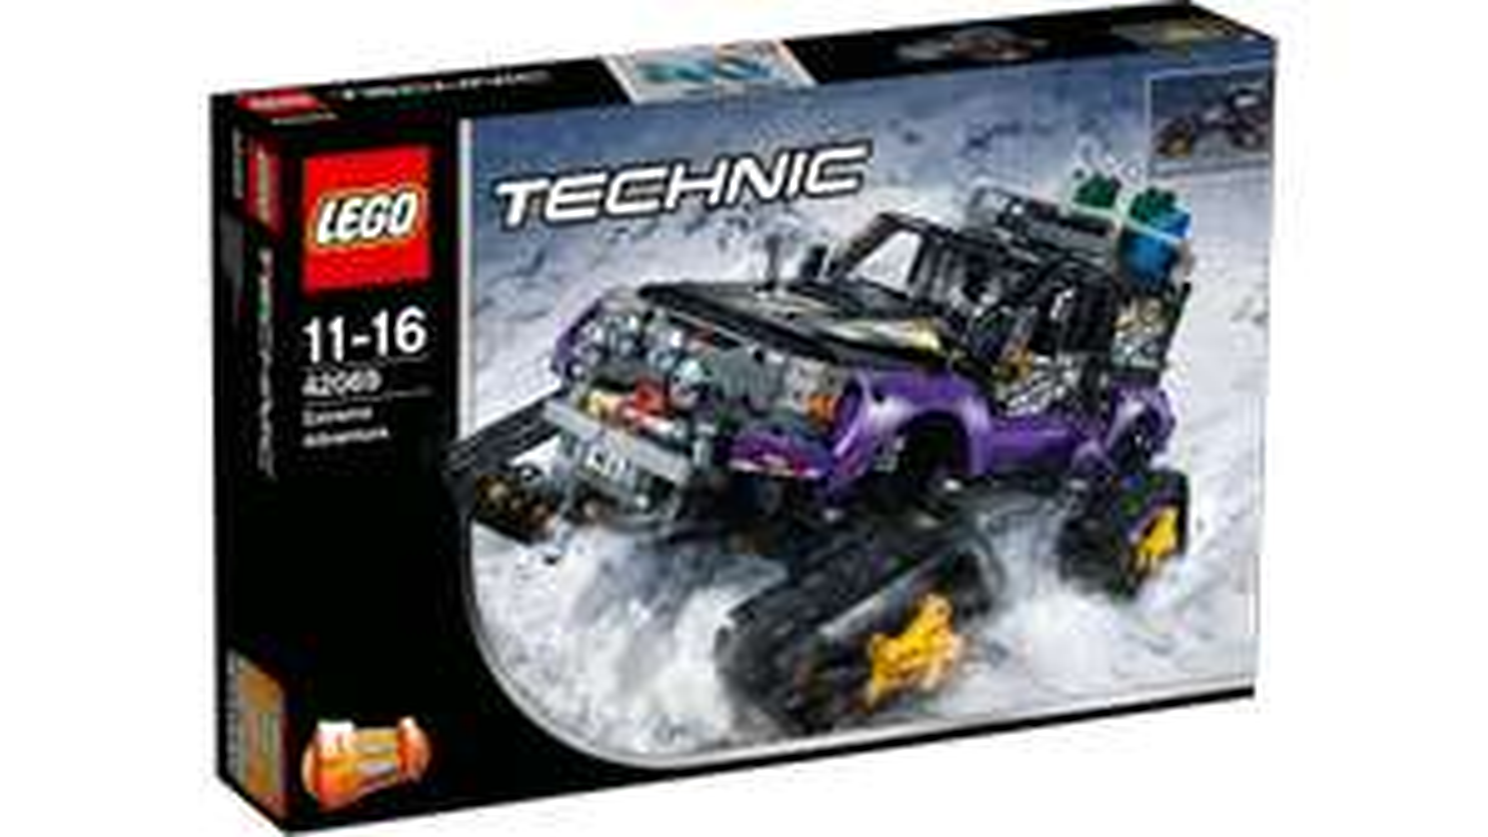 Lego Technic 42069 Extremgeländefahrzeug